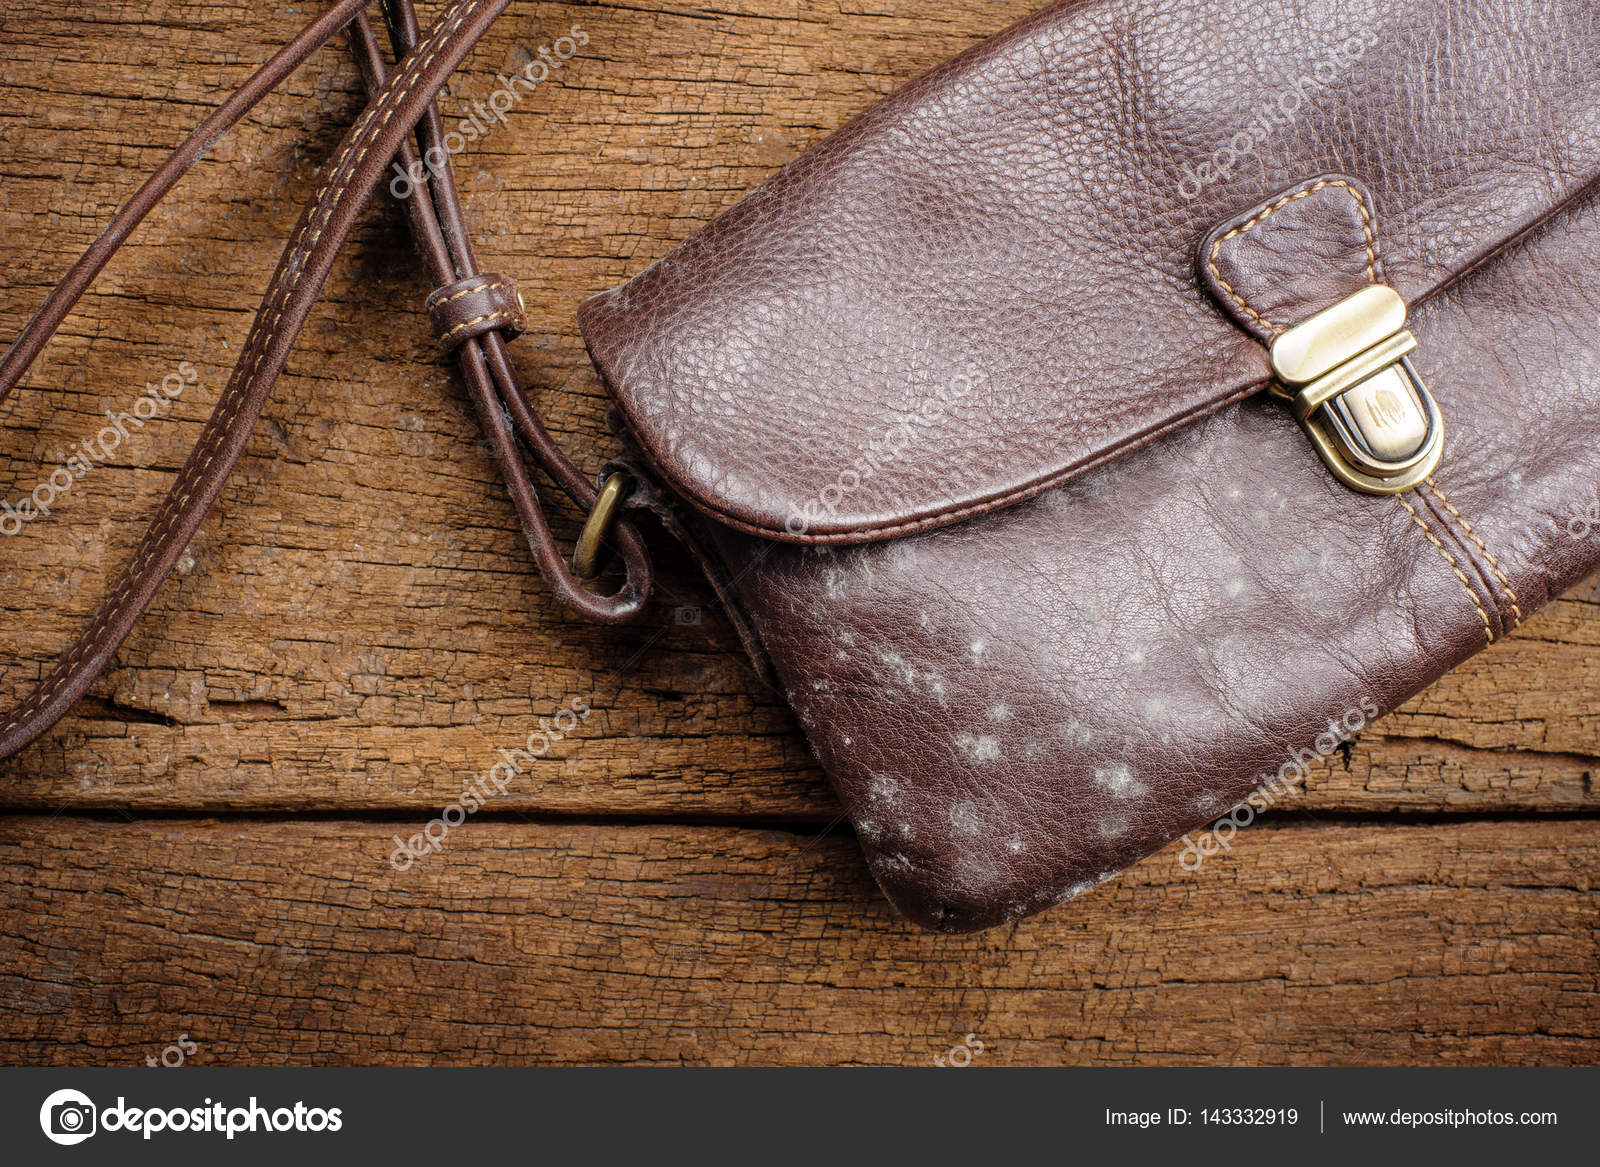 Bekannt Schimmel an Tasche — Stockfoto © norgallery #143332919 LL31